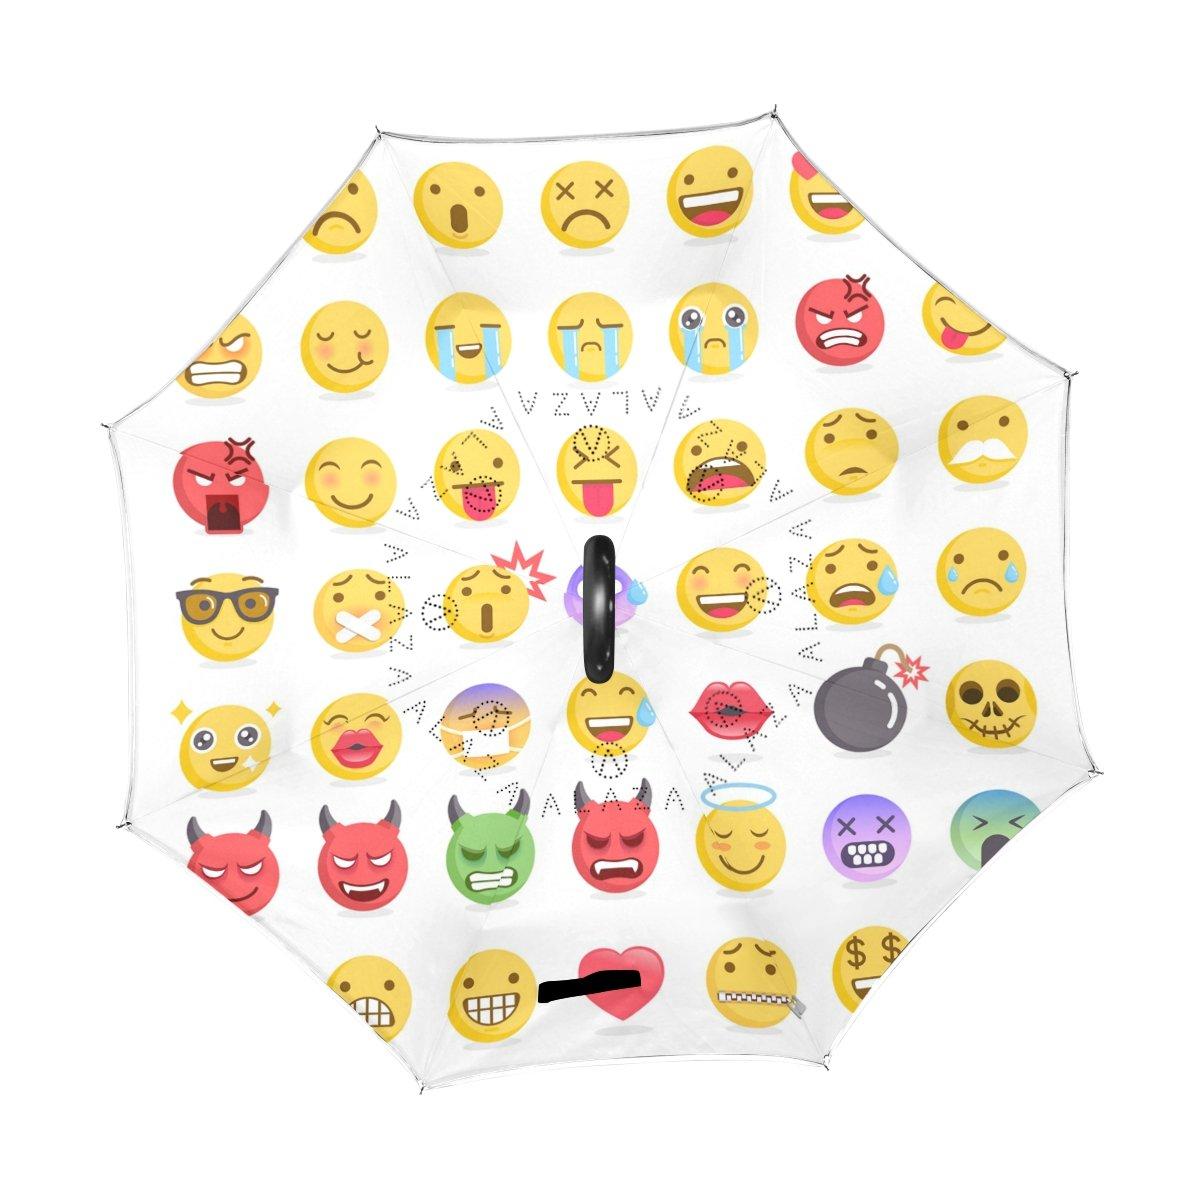 57277842abc9 Amazon.com : My Daily Double Layer Inverted Umbrella Cars Reverse ...